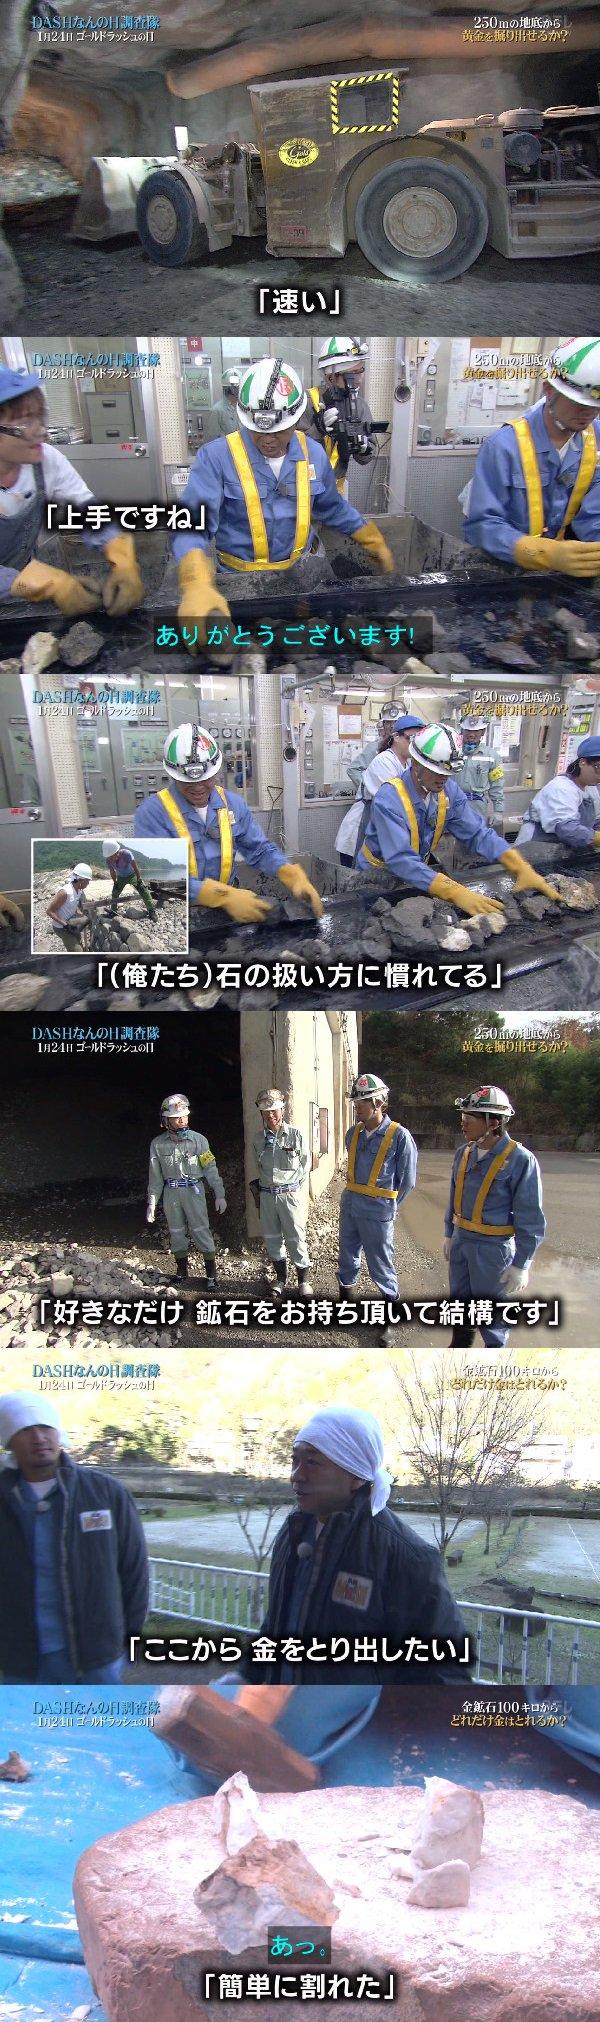 TOKIO 指輪 岩 金 鉄腕DASH!に関連した画像-03